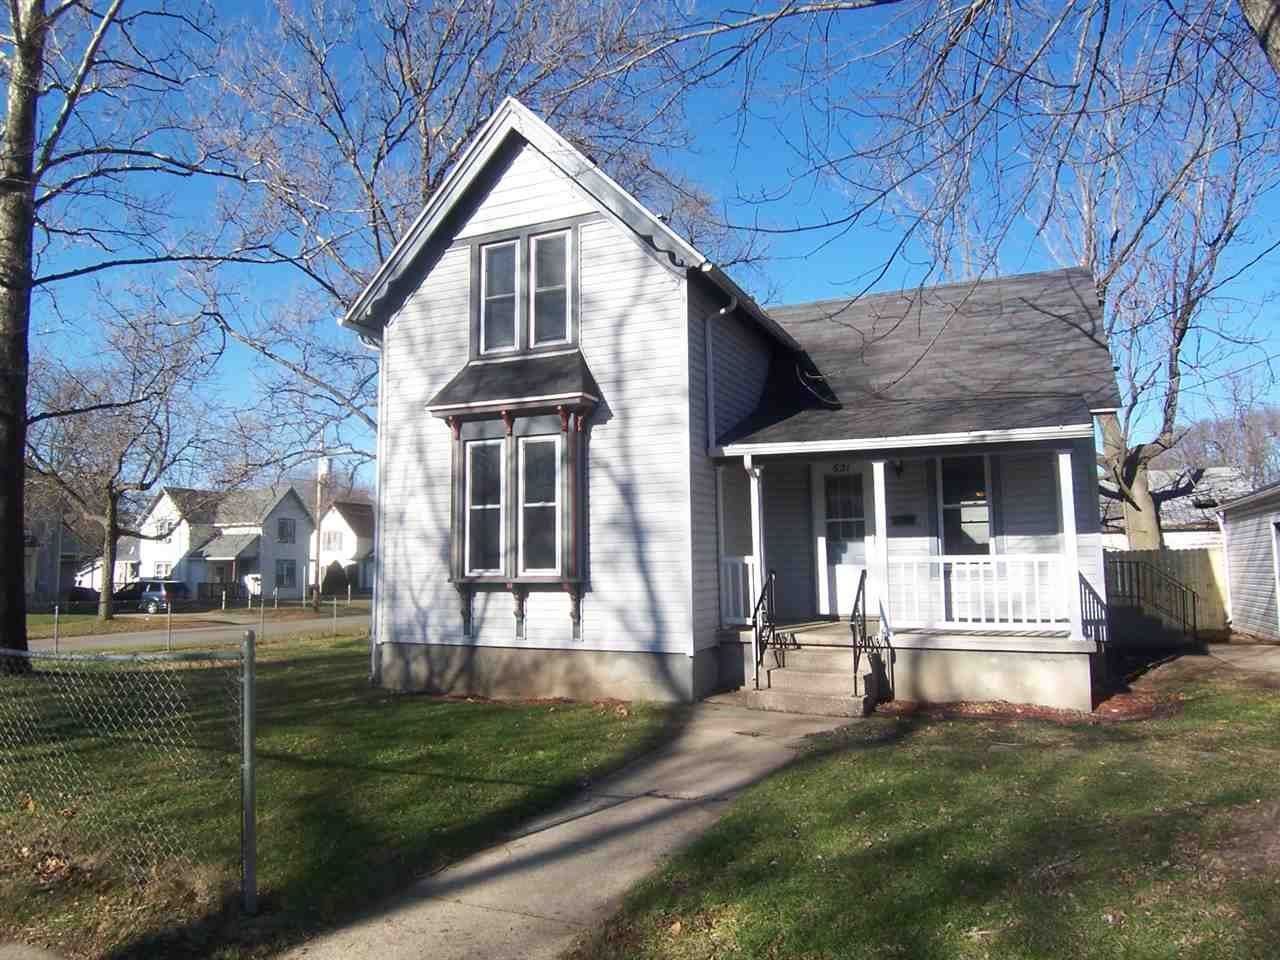 621 Roosevelt Ave, Beloit, WI 53511 - #: 1898650